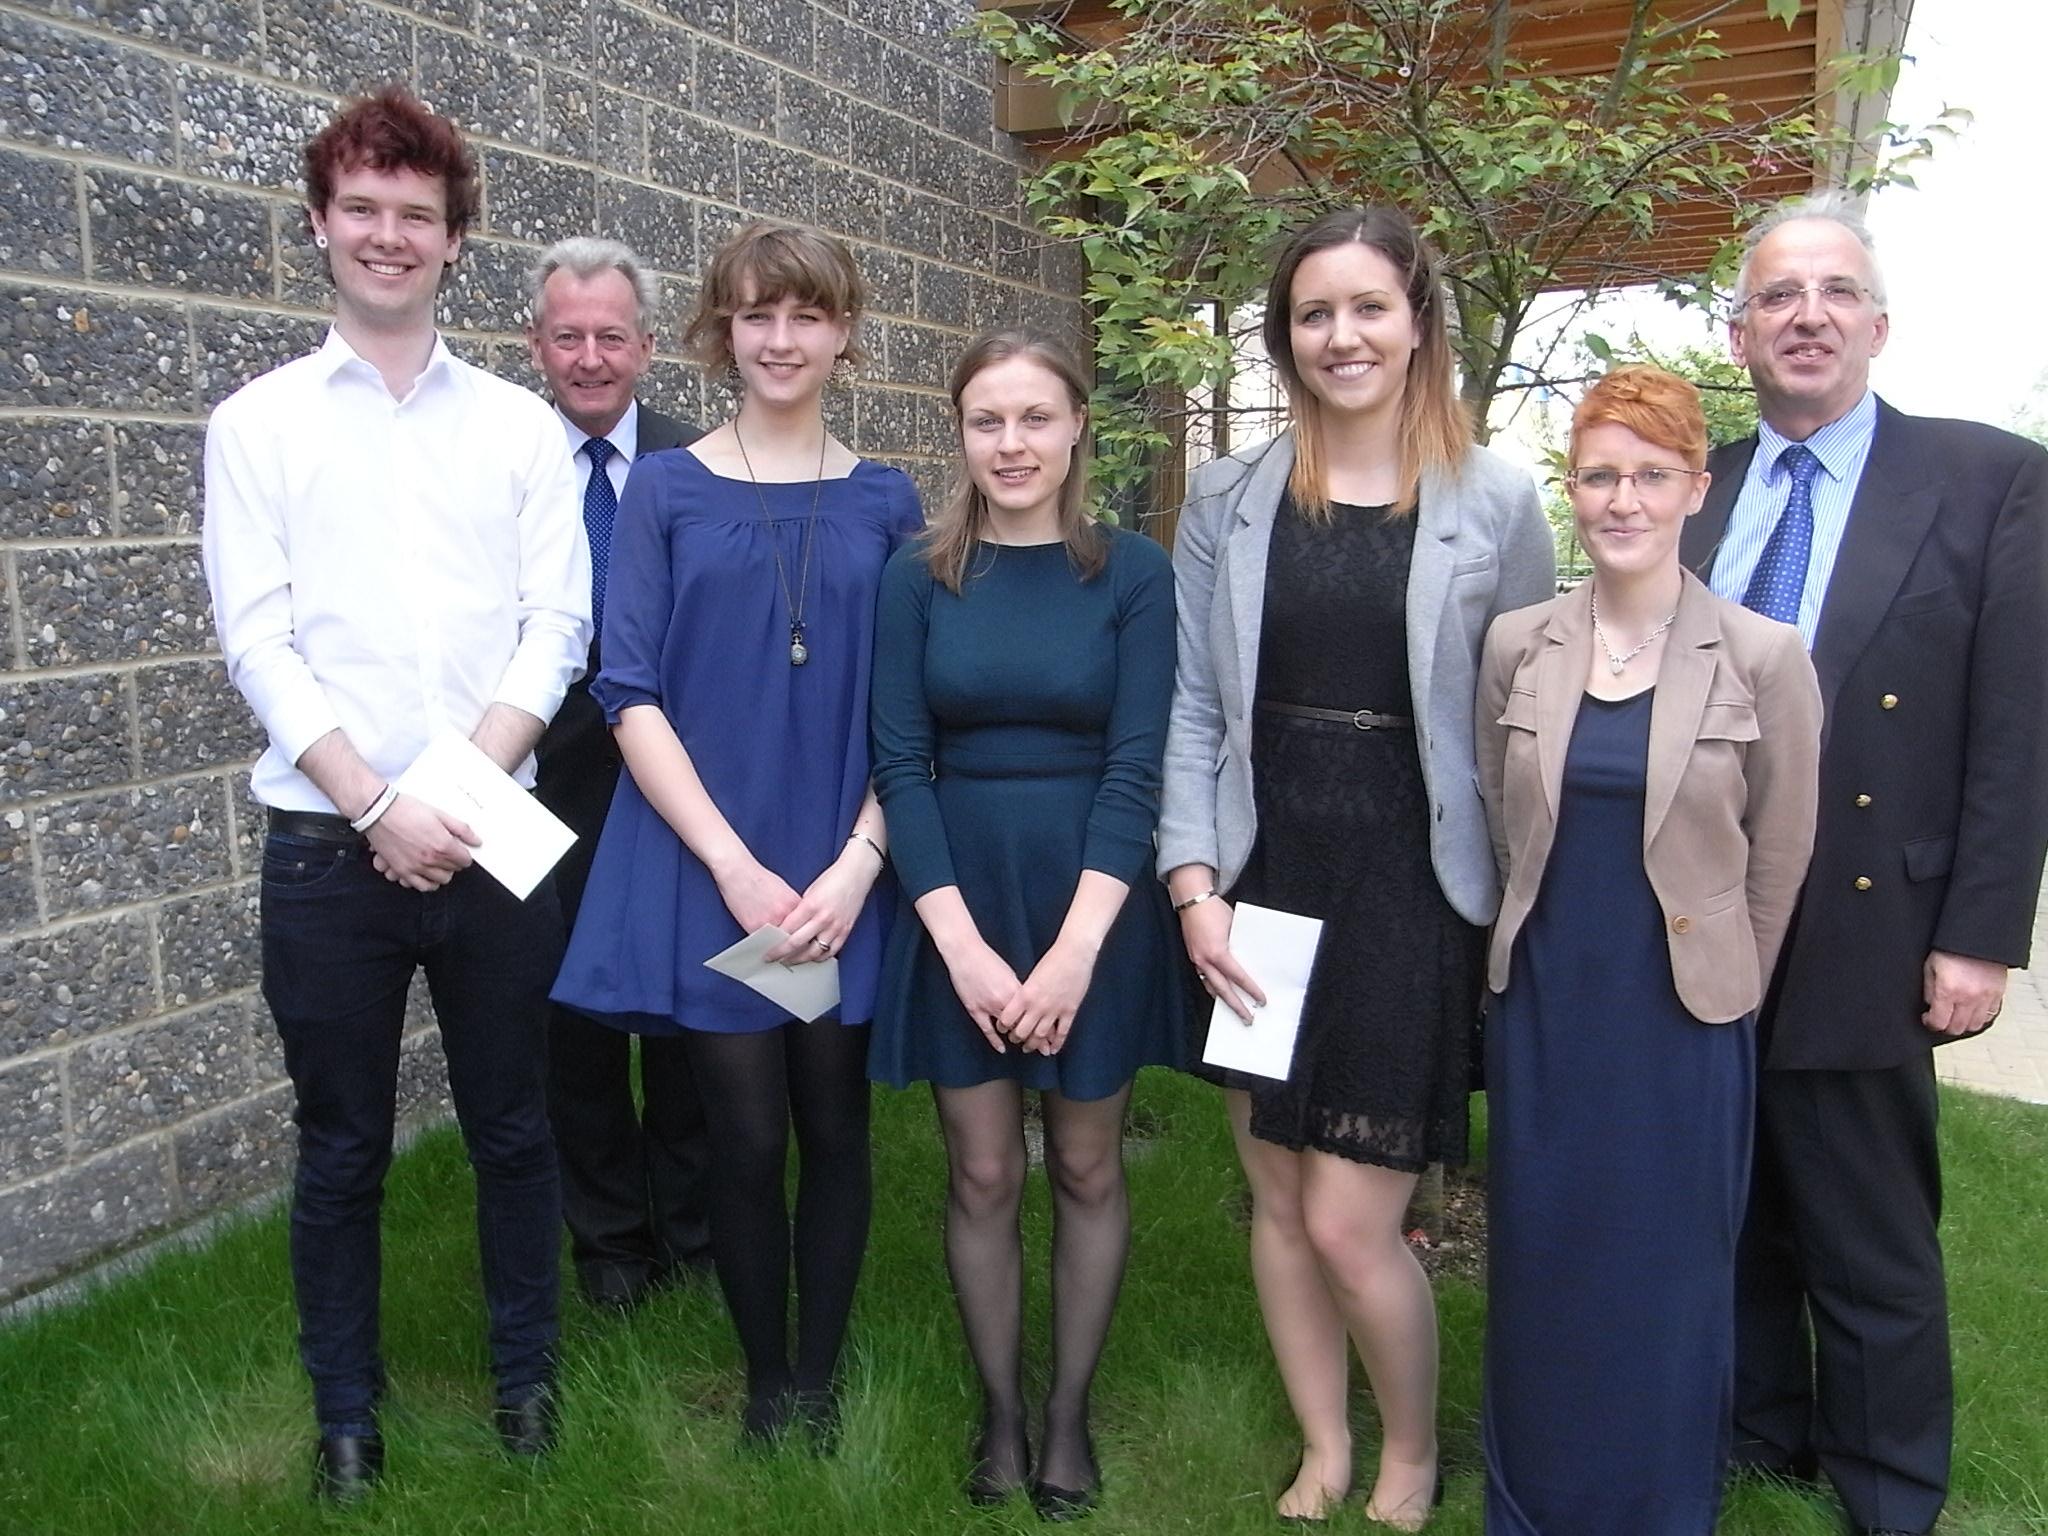 Jack Mcdonnell (l), Steph Richardson, Aisha Bove with Keith Mander, Jonathan Monckton and Kerry of Canterbury Festival